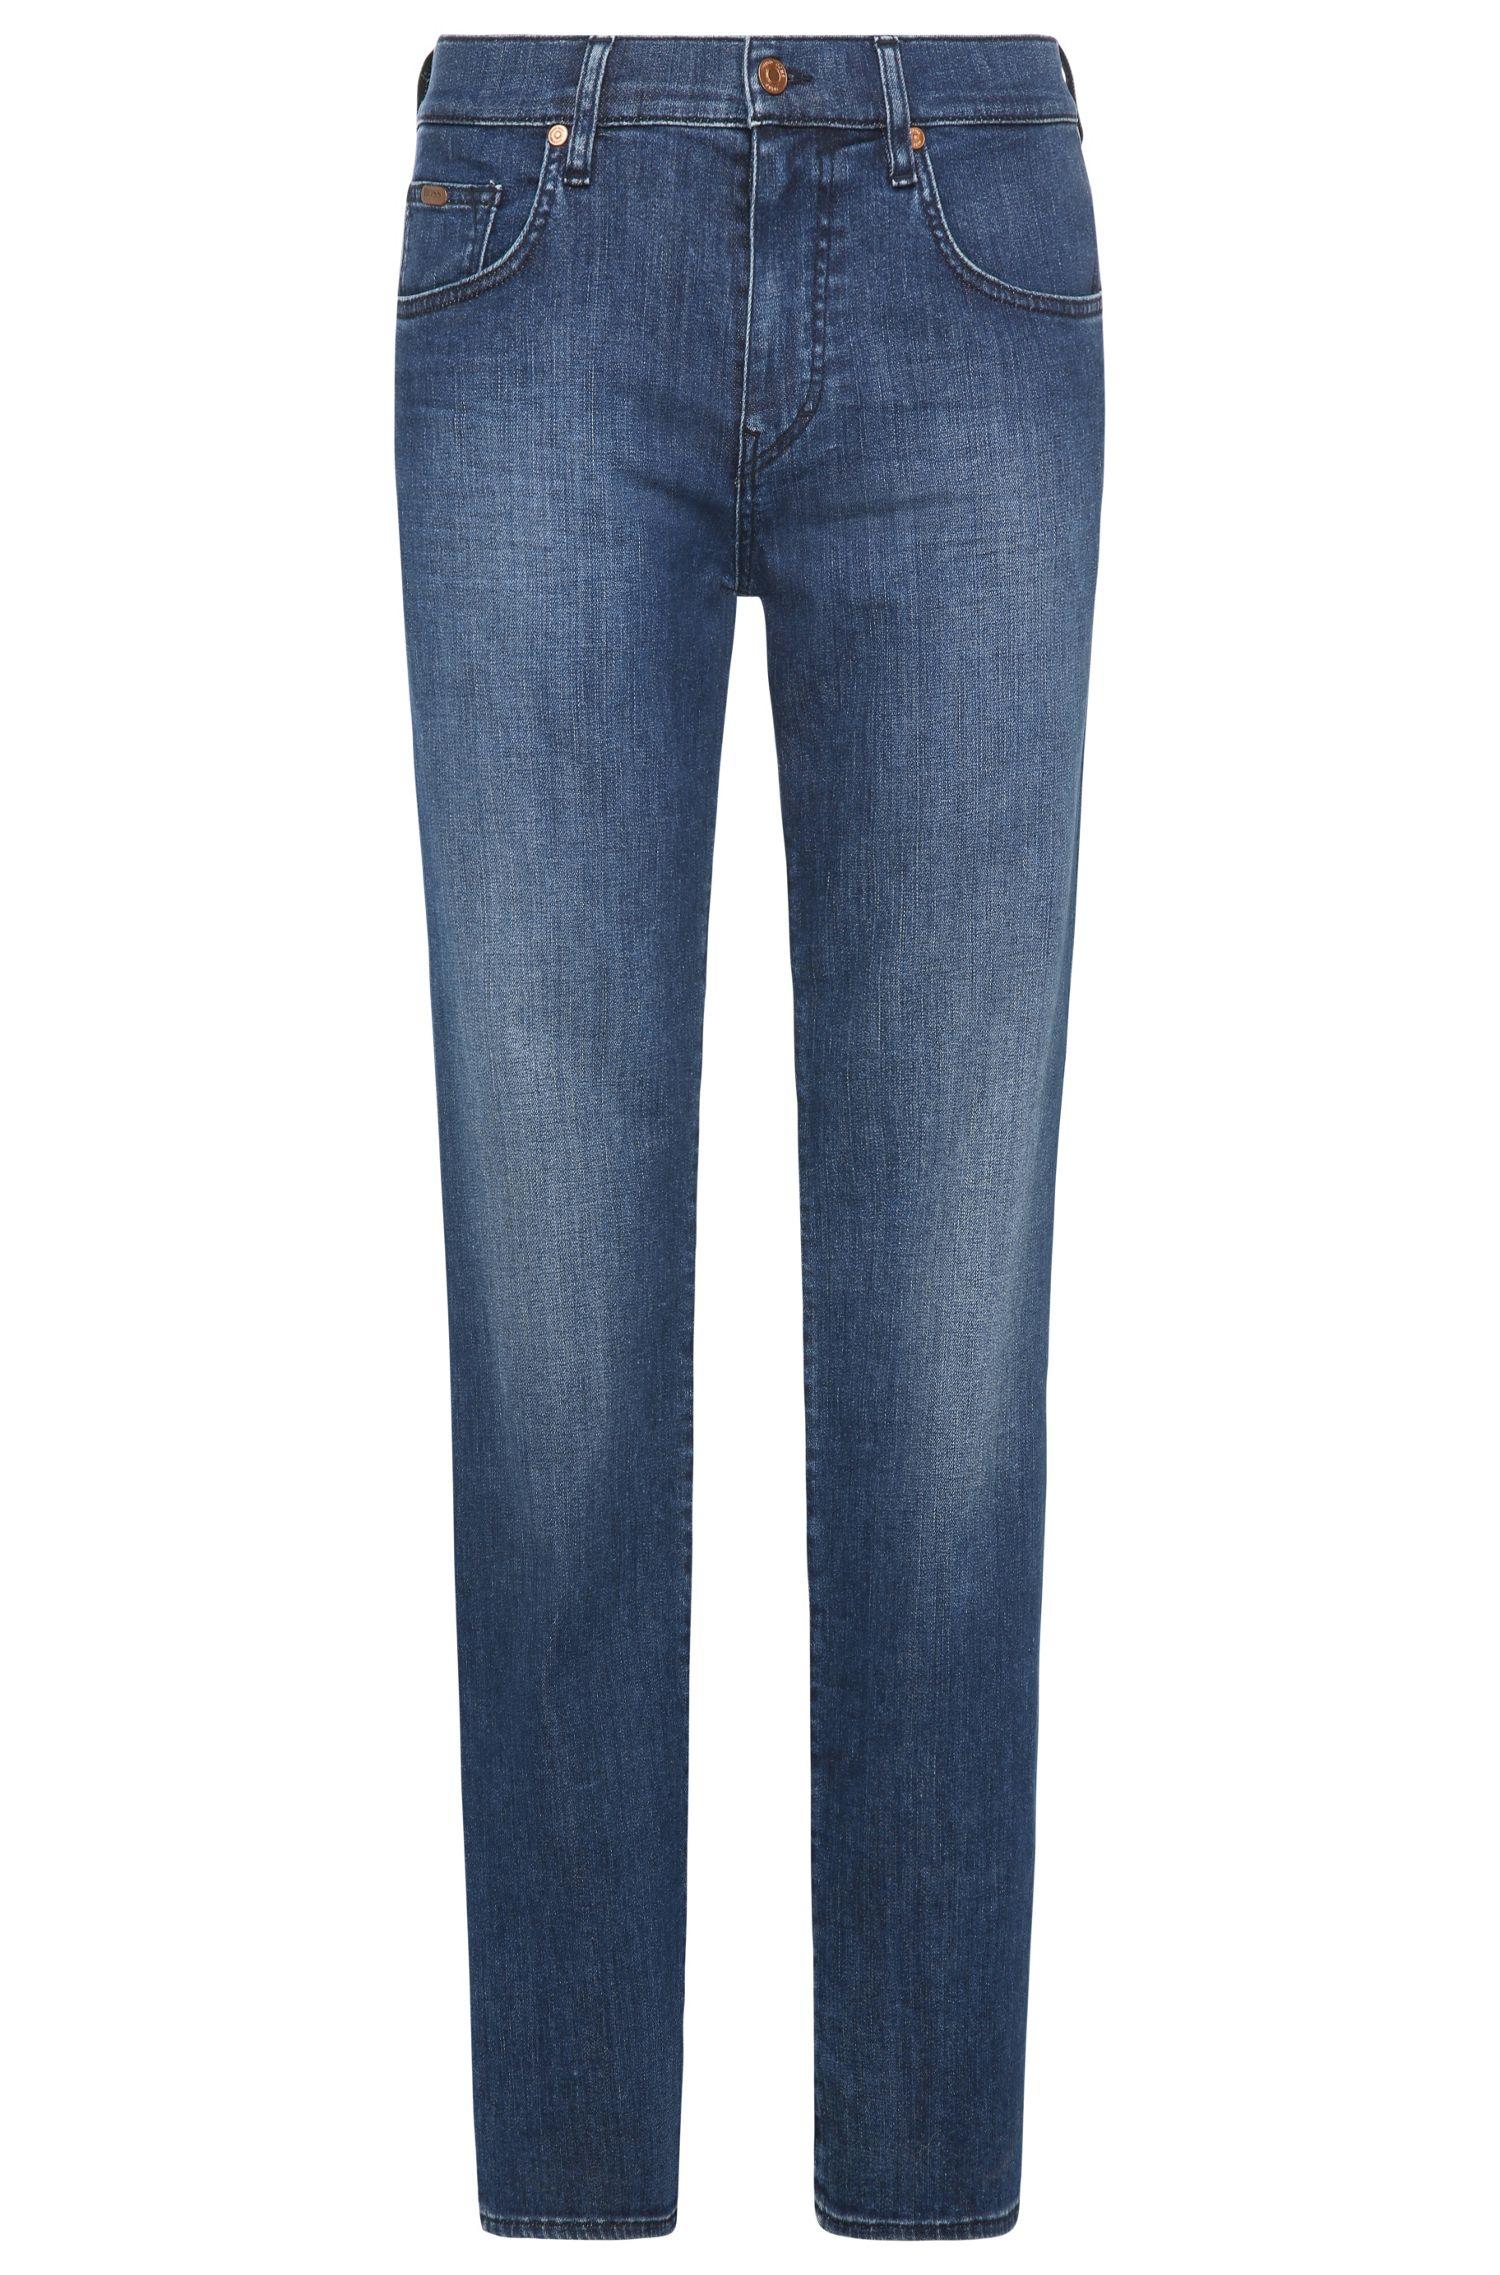 Relaxed-Fit Jeans aus Stretch-Baumwolle mit Waschung: ´C-KANSAS`